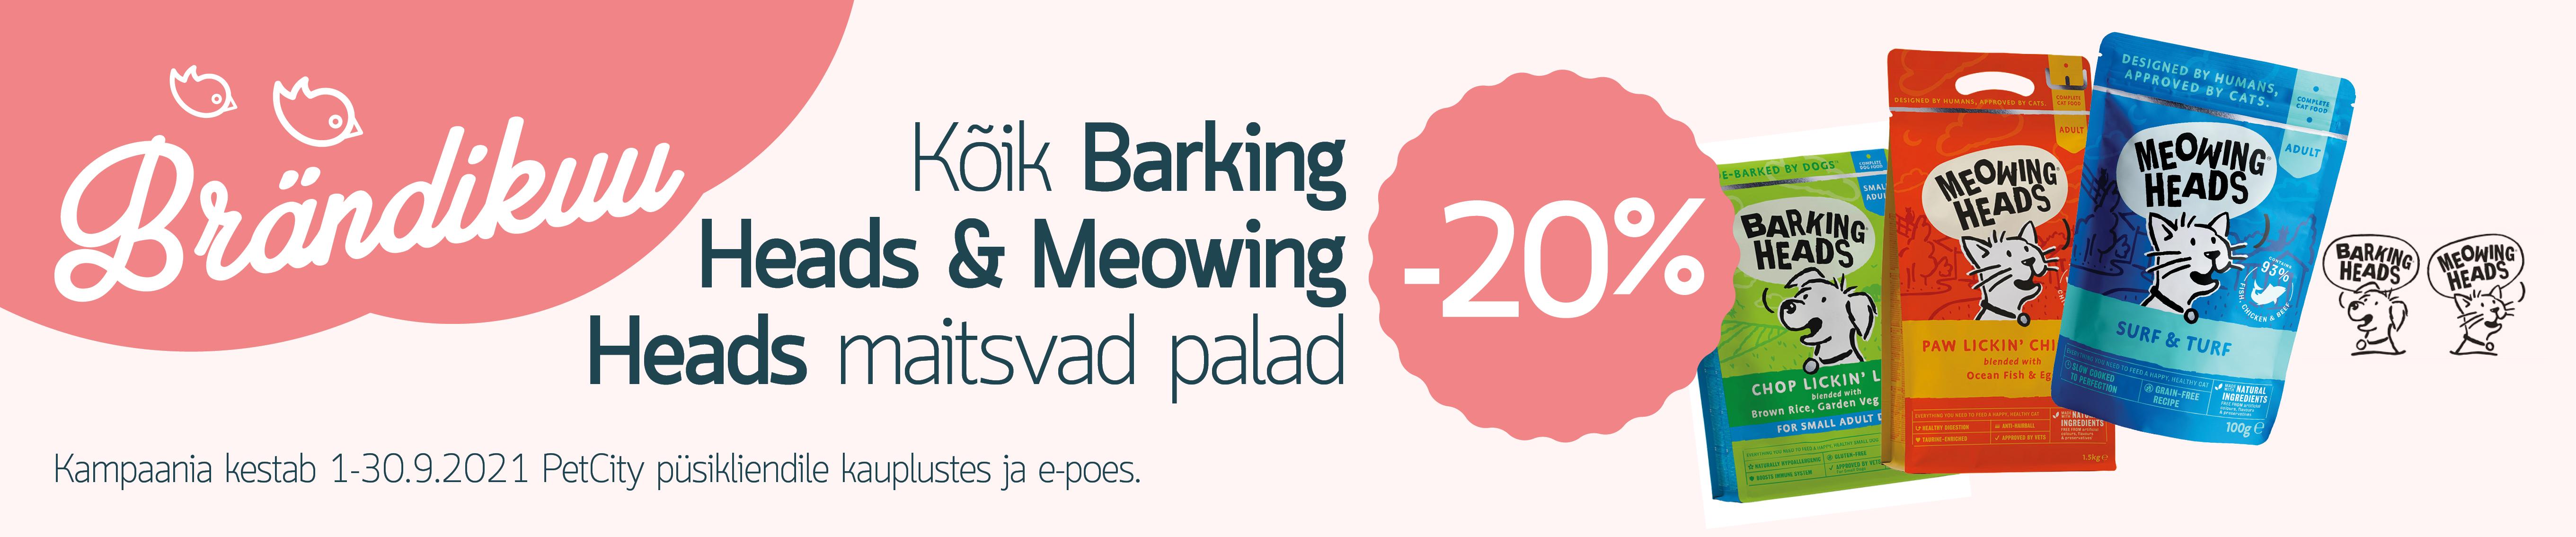 BARKING & MEOWING HEADS -20%